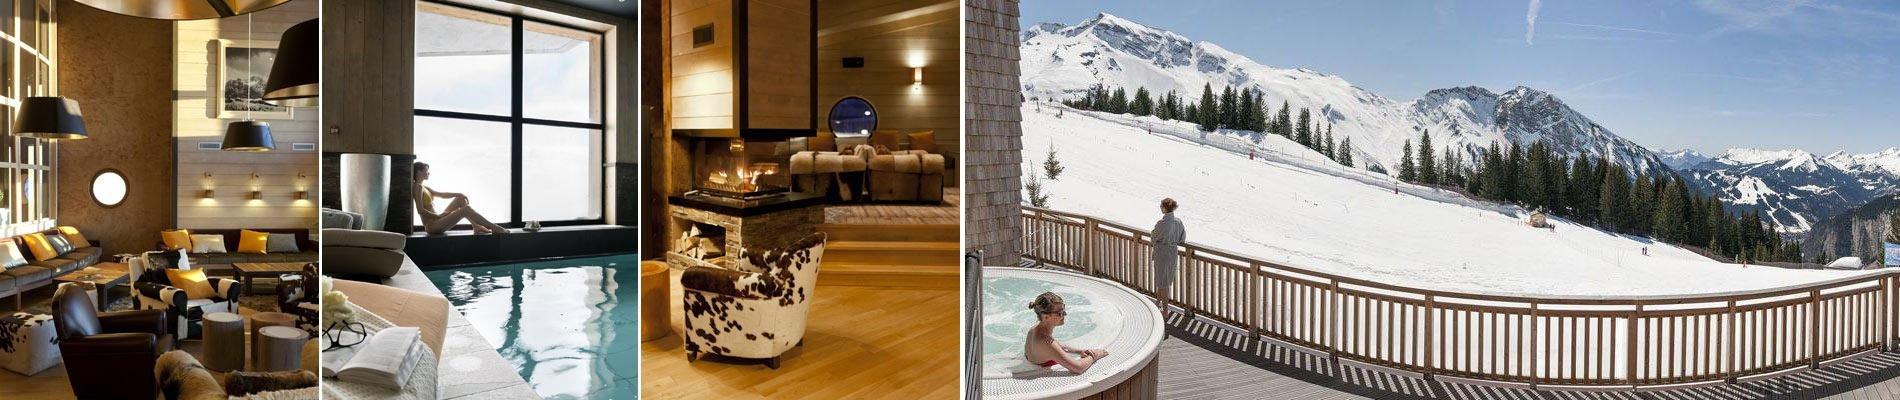 amara-avoriaz-frankrijk-wintersport-pierre-et-vacances